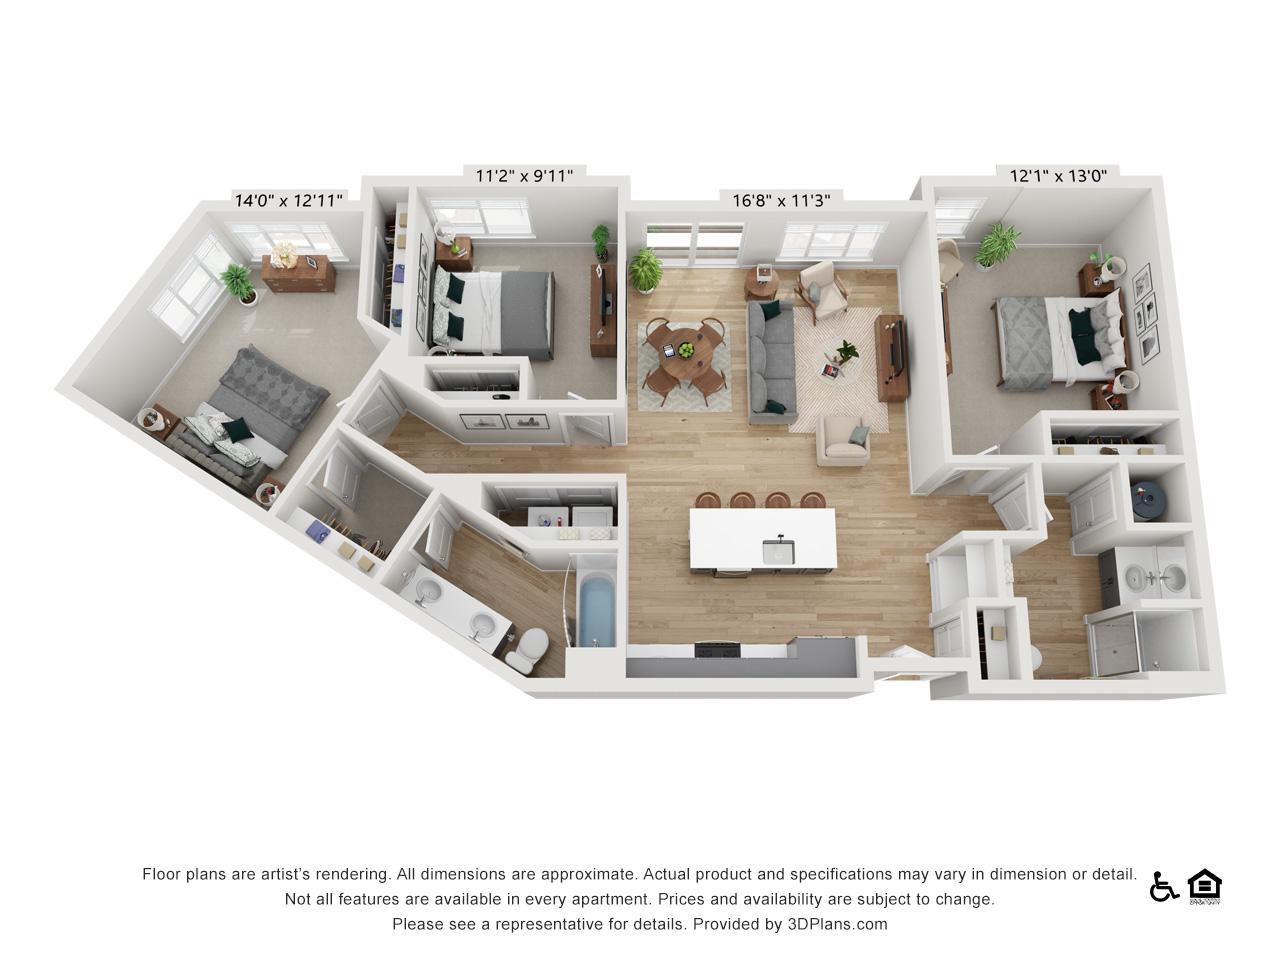 Three Bedroom D | 3 Bedrooms | 2 Bathrooms | 1,378 sq ft